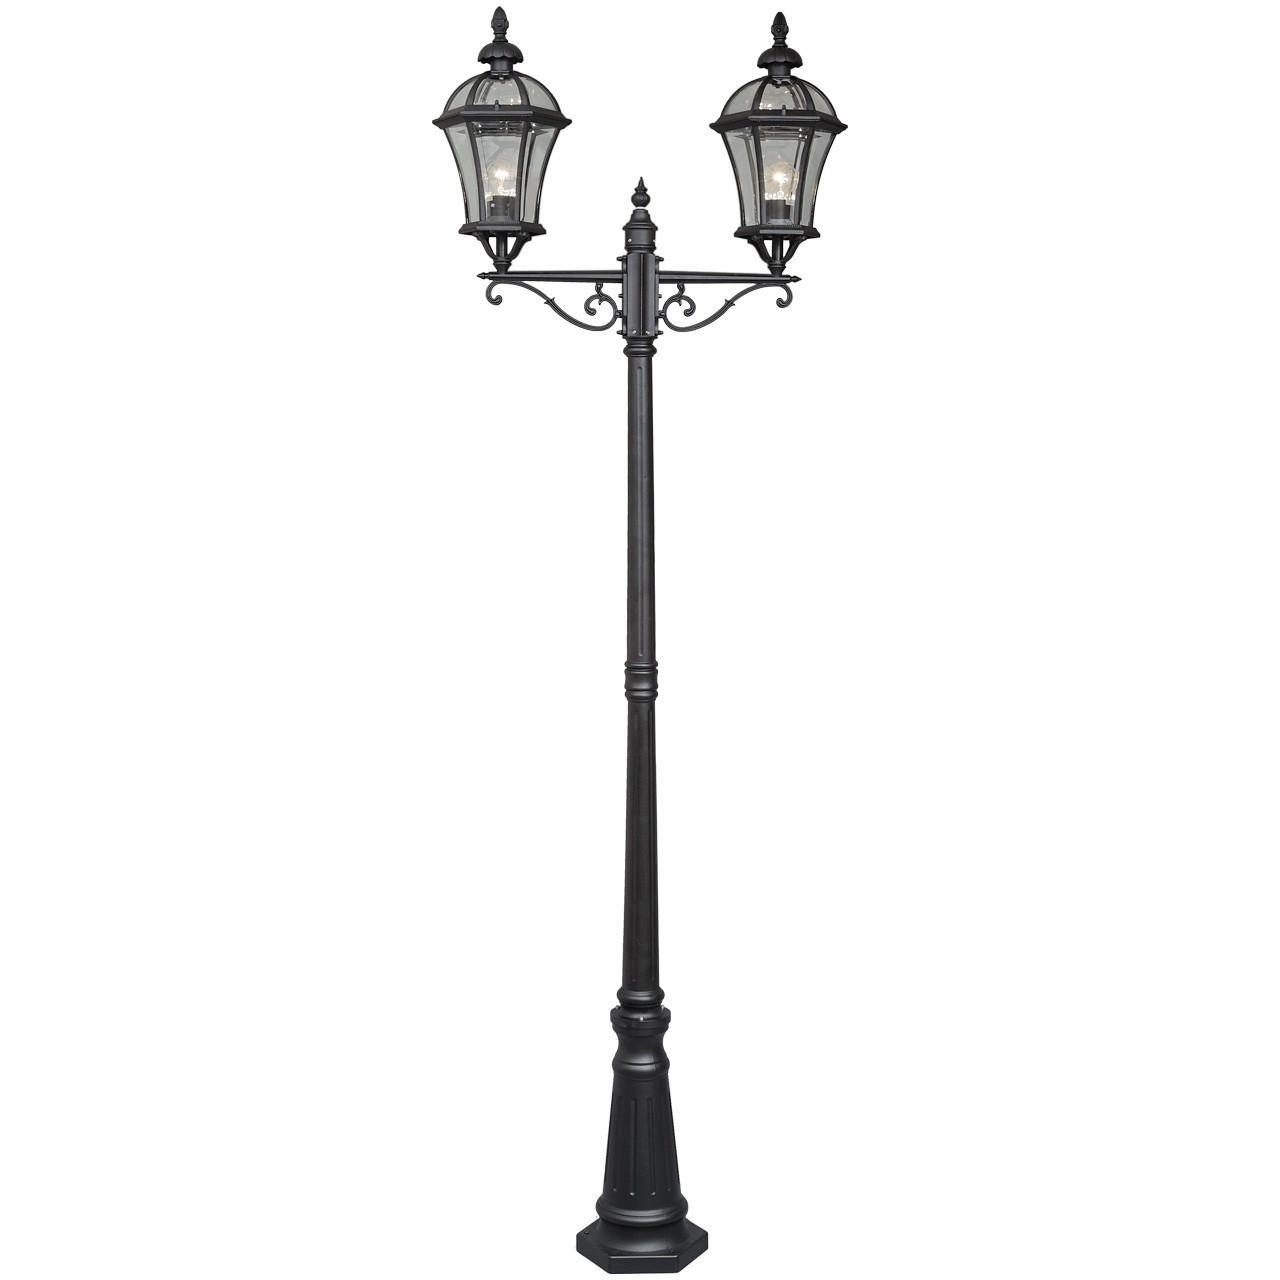 Светильник De markt 811040602 2/95w e27 светильник de markt 813010401